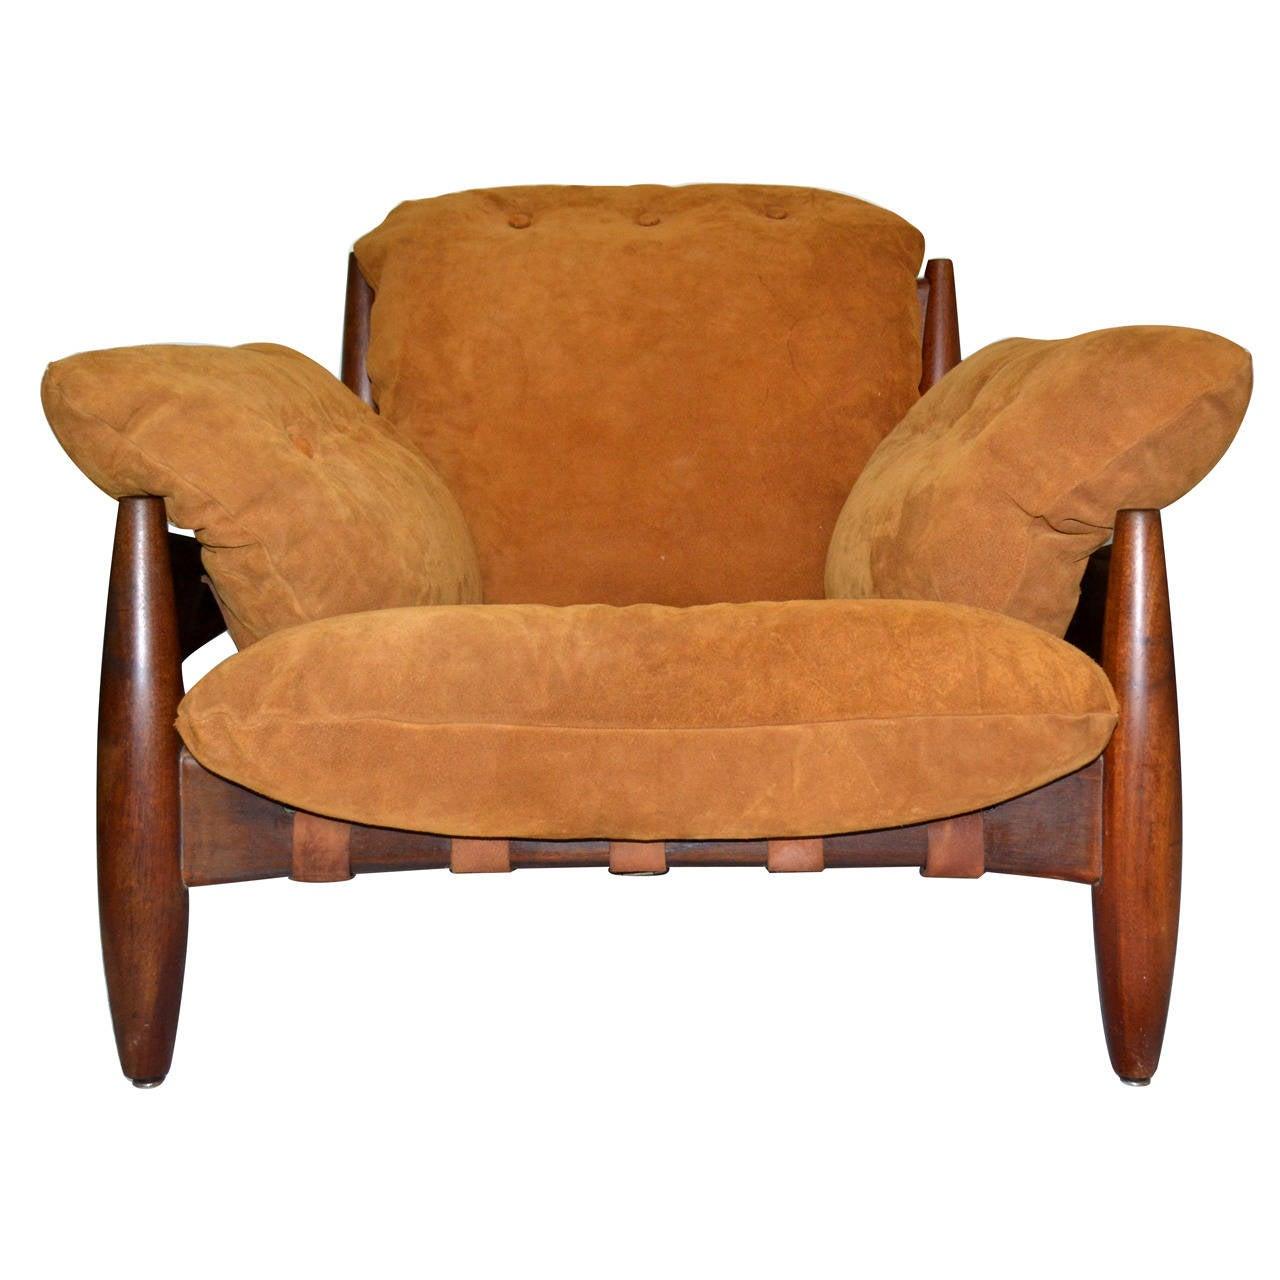 sergio rodrigues mid century rosewood mole  sheriff chair brazil  - sergio rodrigues mid century rosewood mole  sheriff chair brazil circa